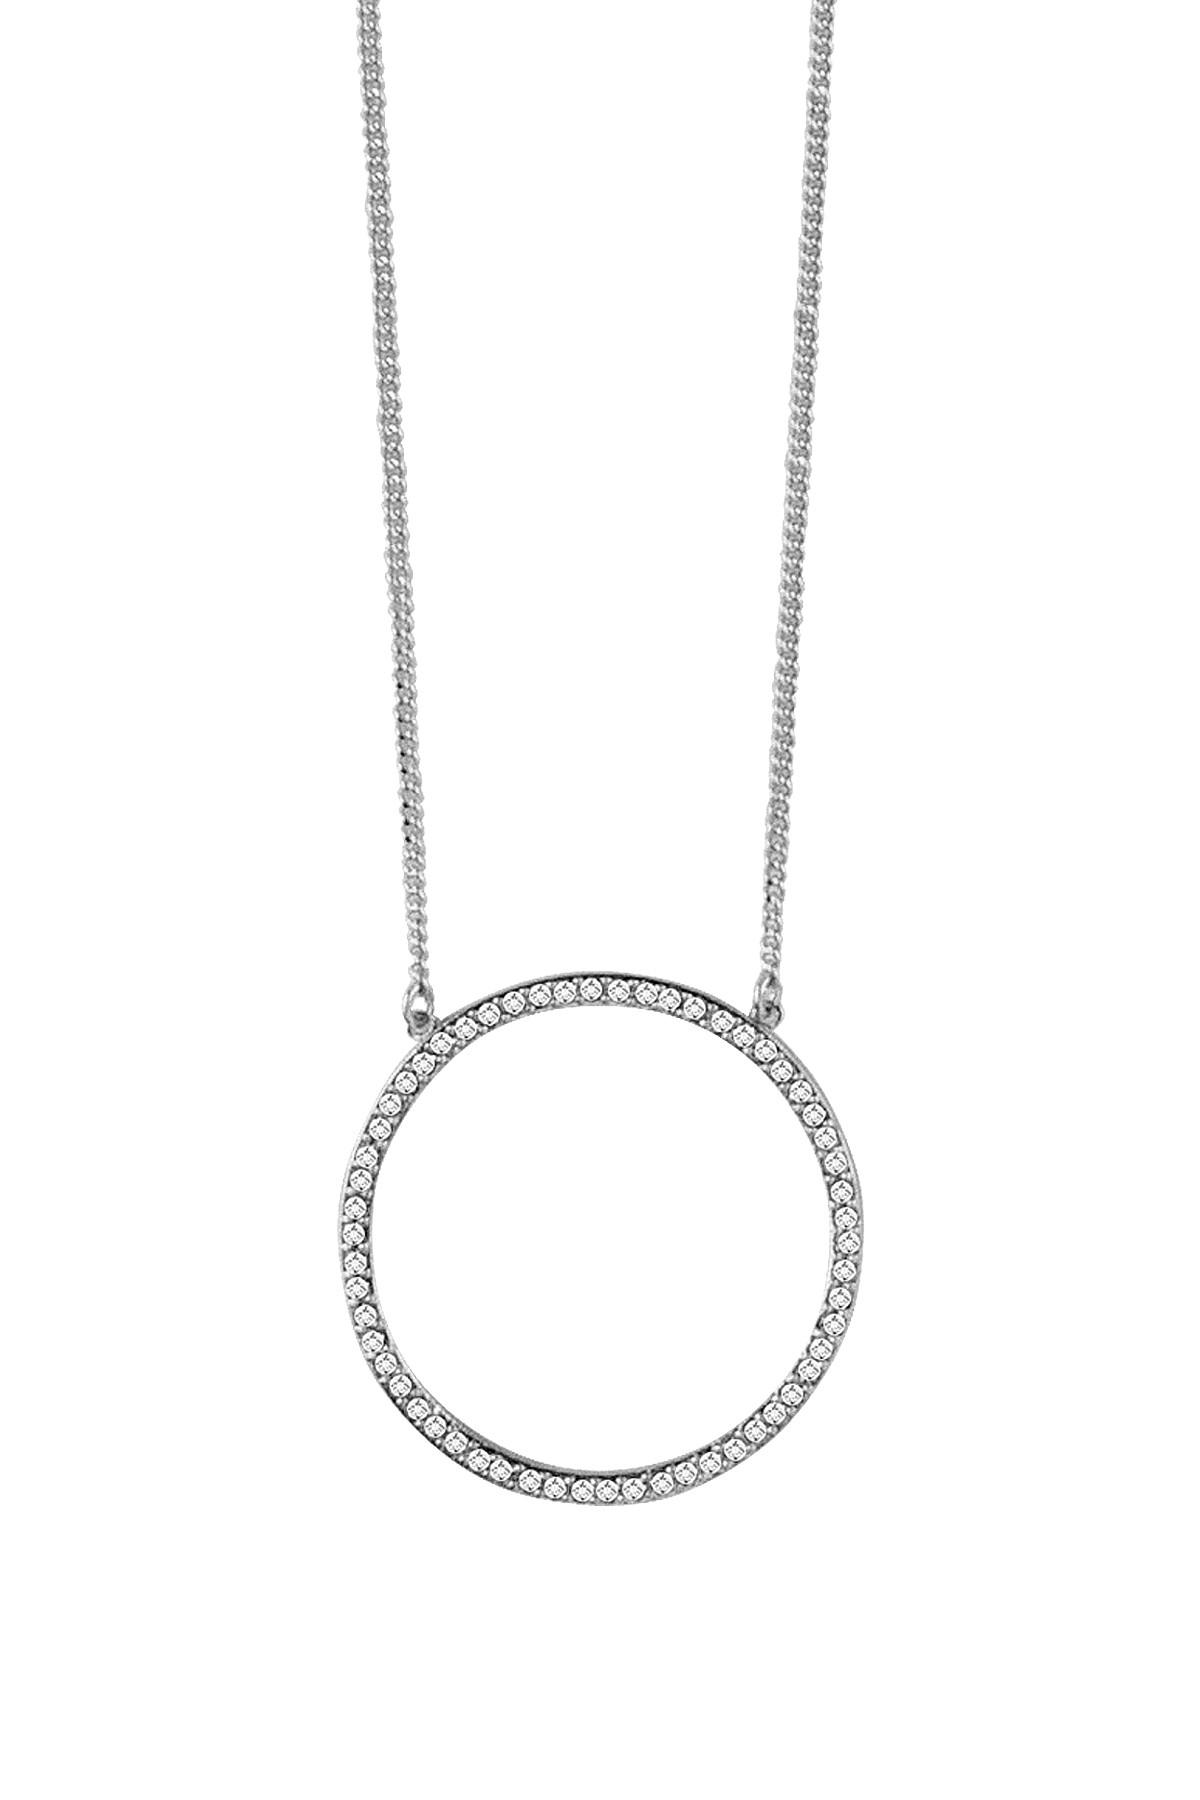 Image of   DYRBERG/KERN ARLIE HALSKÆDE 350833 (Silver, Crystal, ONESIZE)